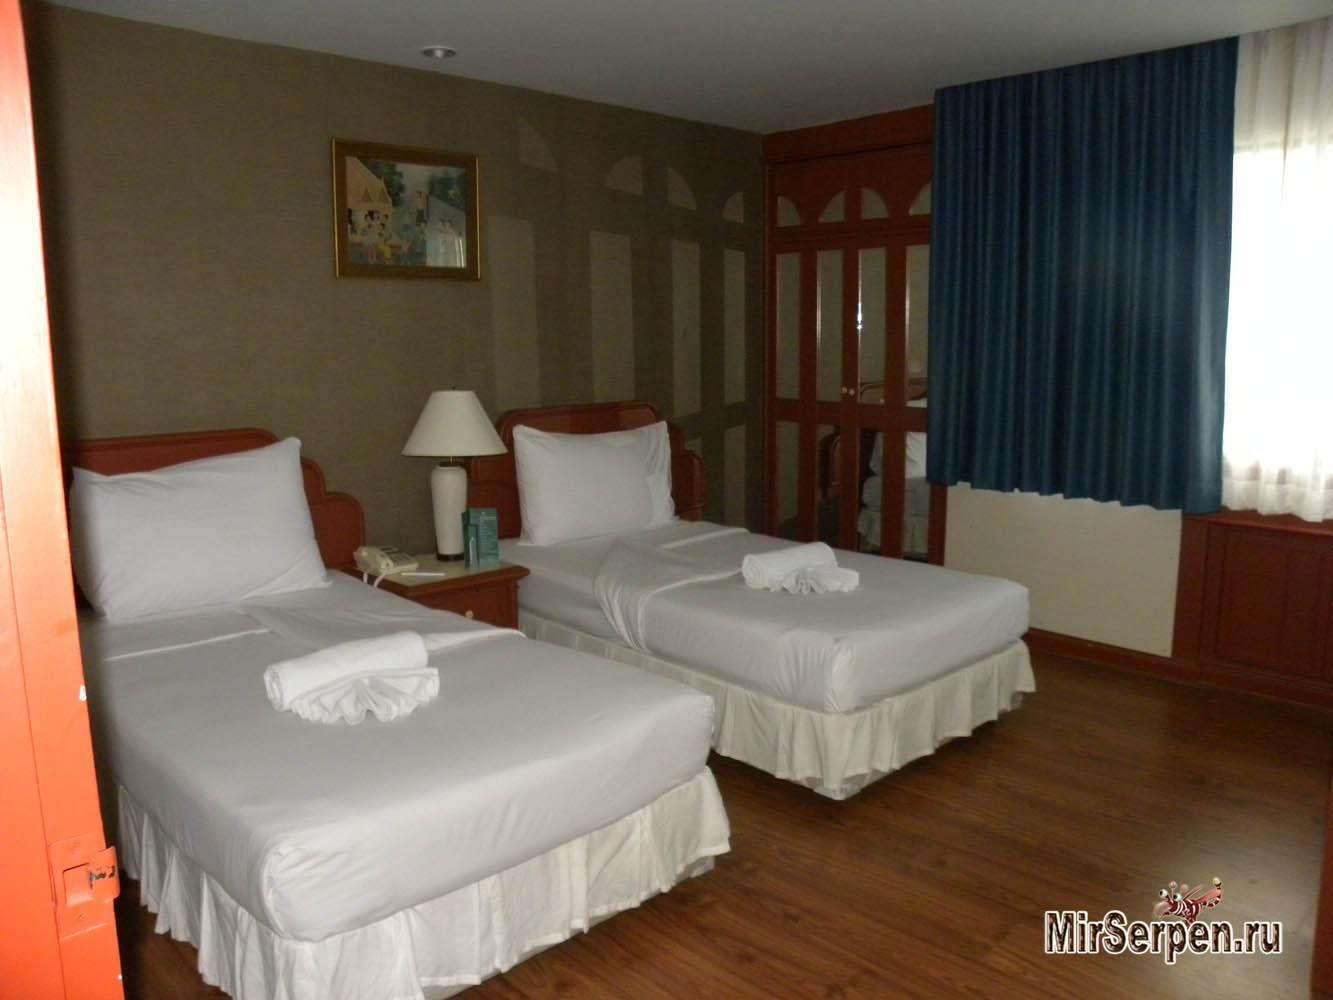 Отзыв об отеле Baiyoke Suite Hotel 3*, Бангкок, Таиланд